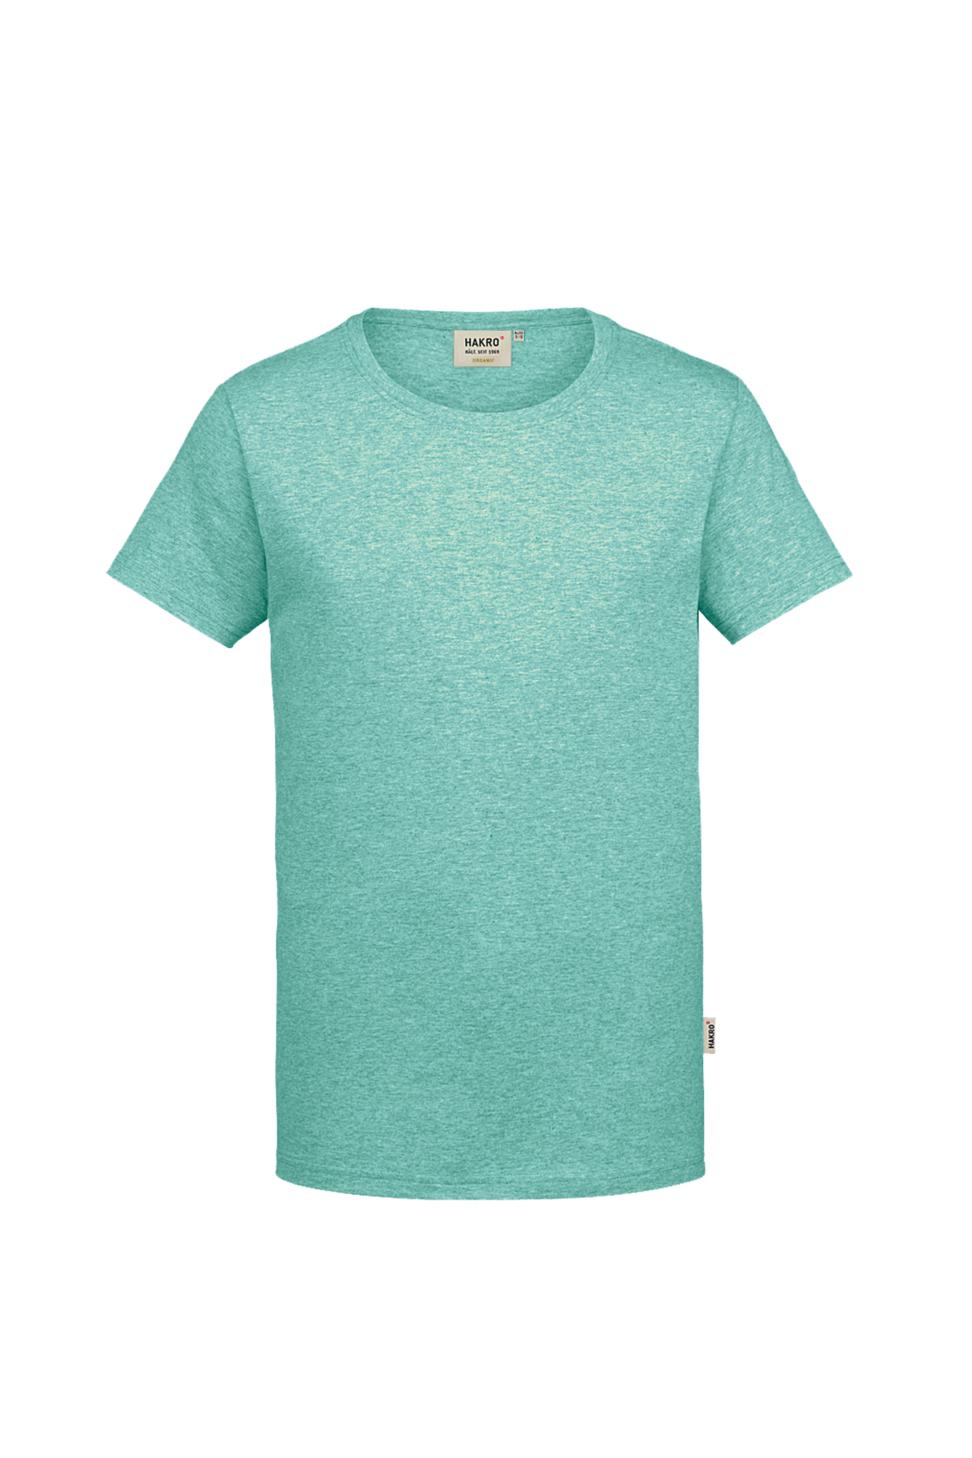 No271 - T-Shirt Organic